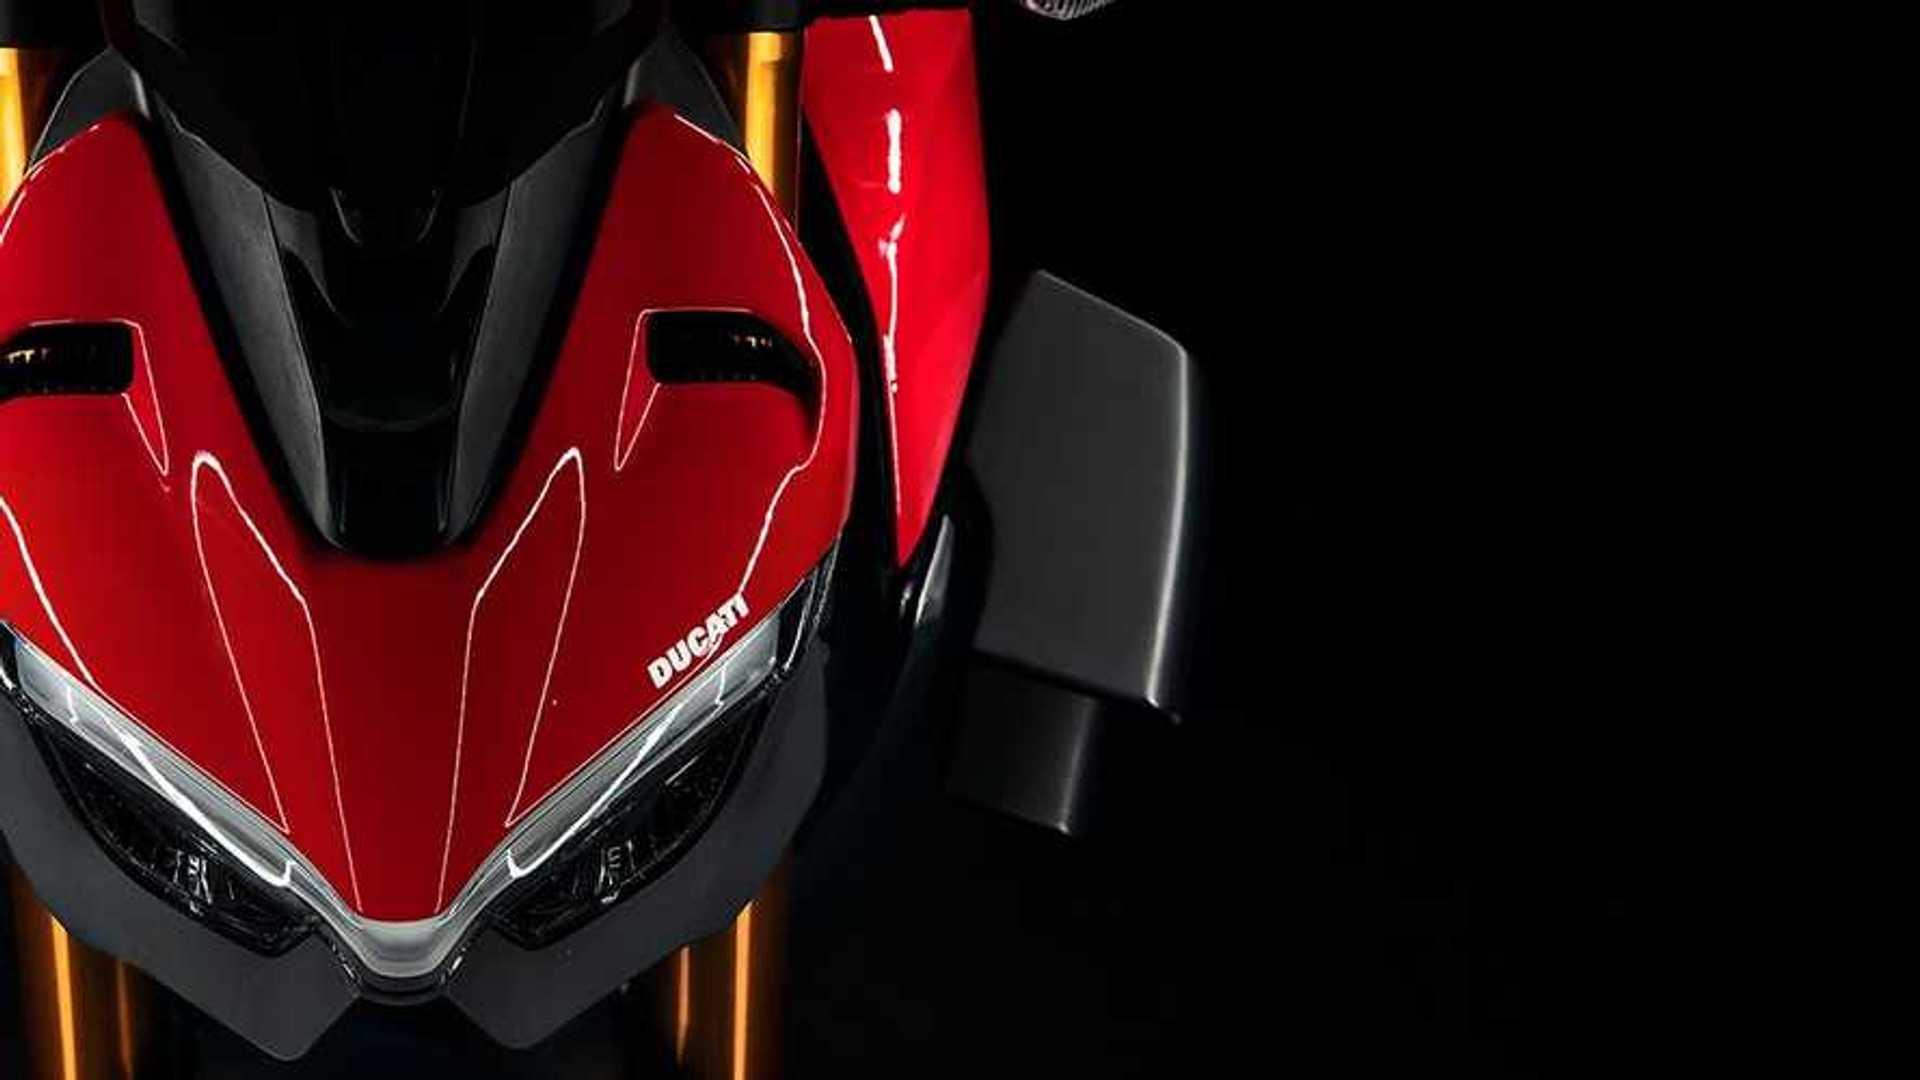 Ducati Officially Announces Streetfighter V4 In Rimini